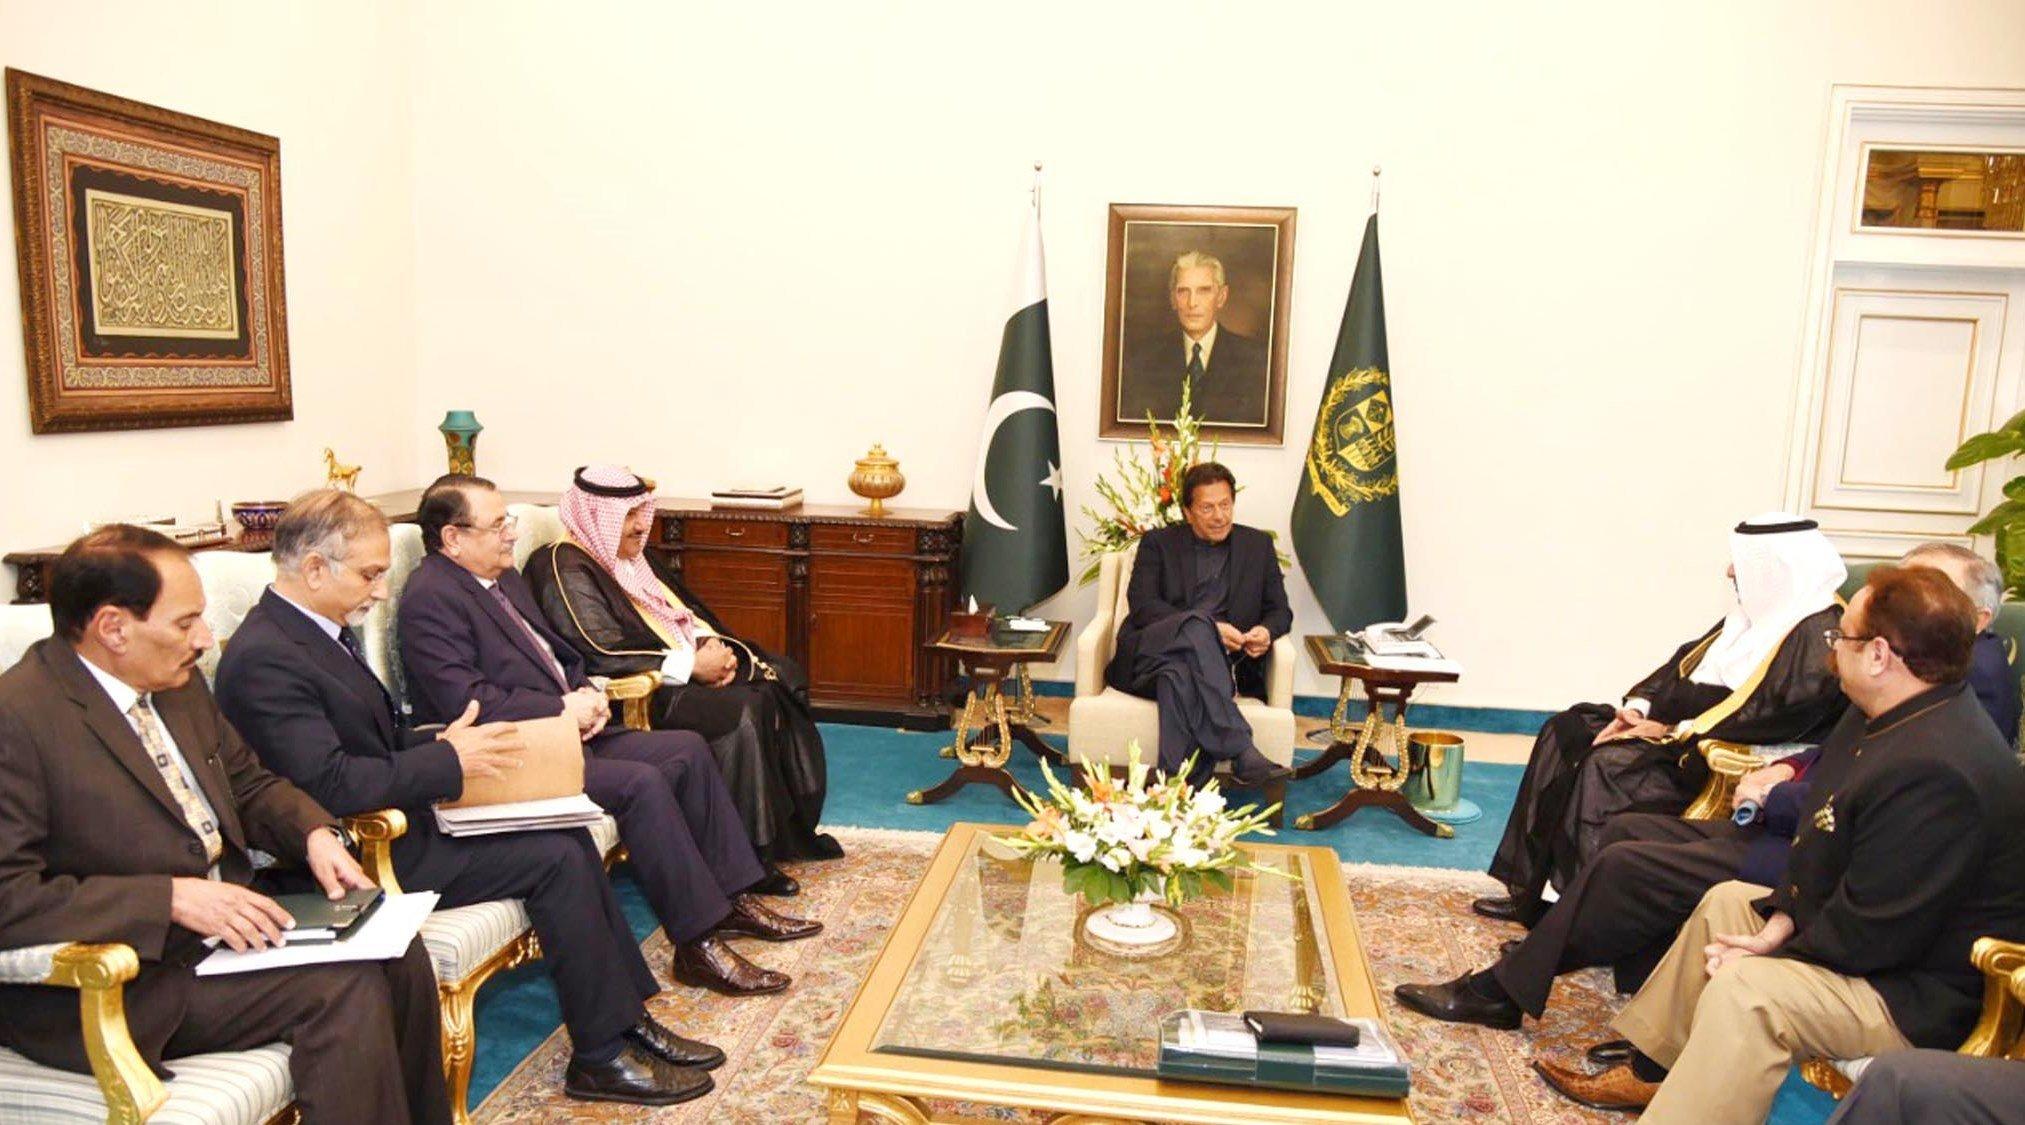 Prime Minister Imran Khan in a meeting with Tamimi Group of Companies Chairman Sheikh Tariq Ali Abdullah Al-Tamimi in Islamabad